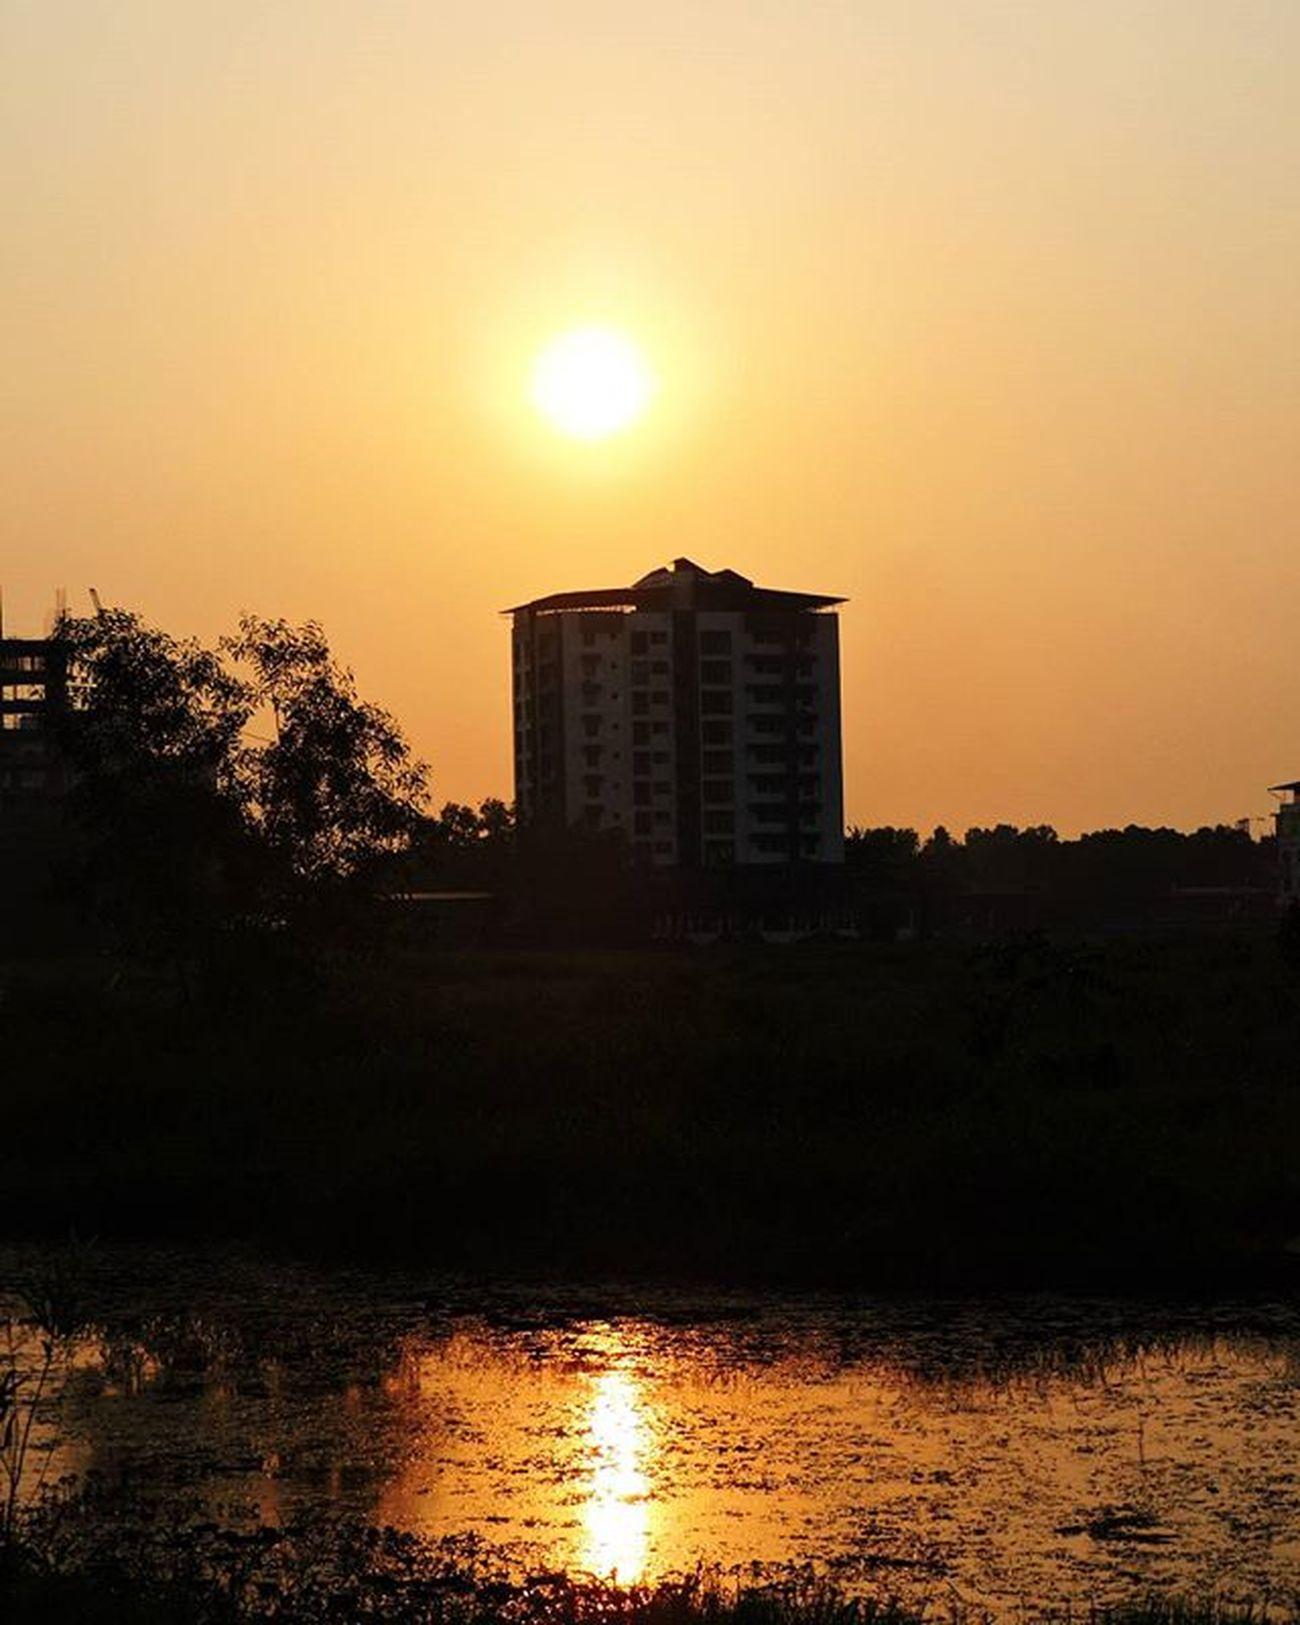 Kottayam ✌ my click Eveningclick PhotographyLove Picoftheday Photography Eve Sun Sunset Reflection Town City Water Kottayam Nikon Instagraphy Instalove Instaeve